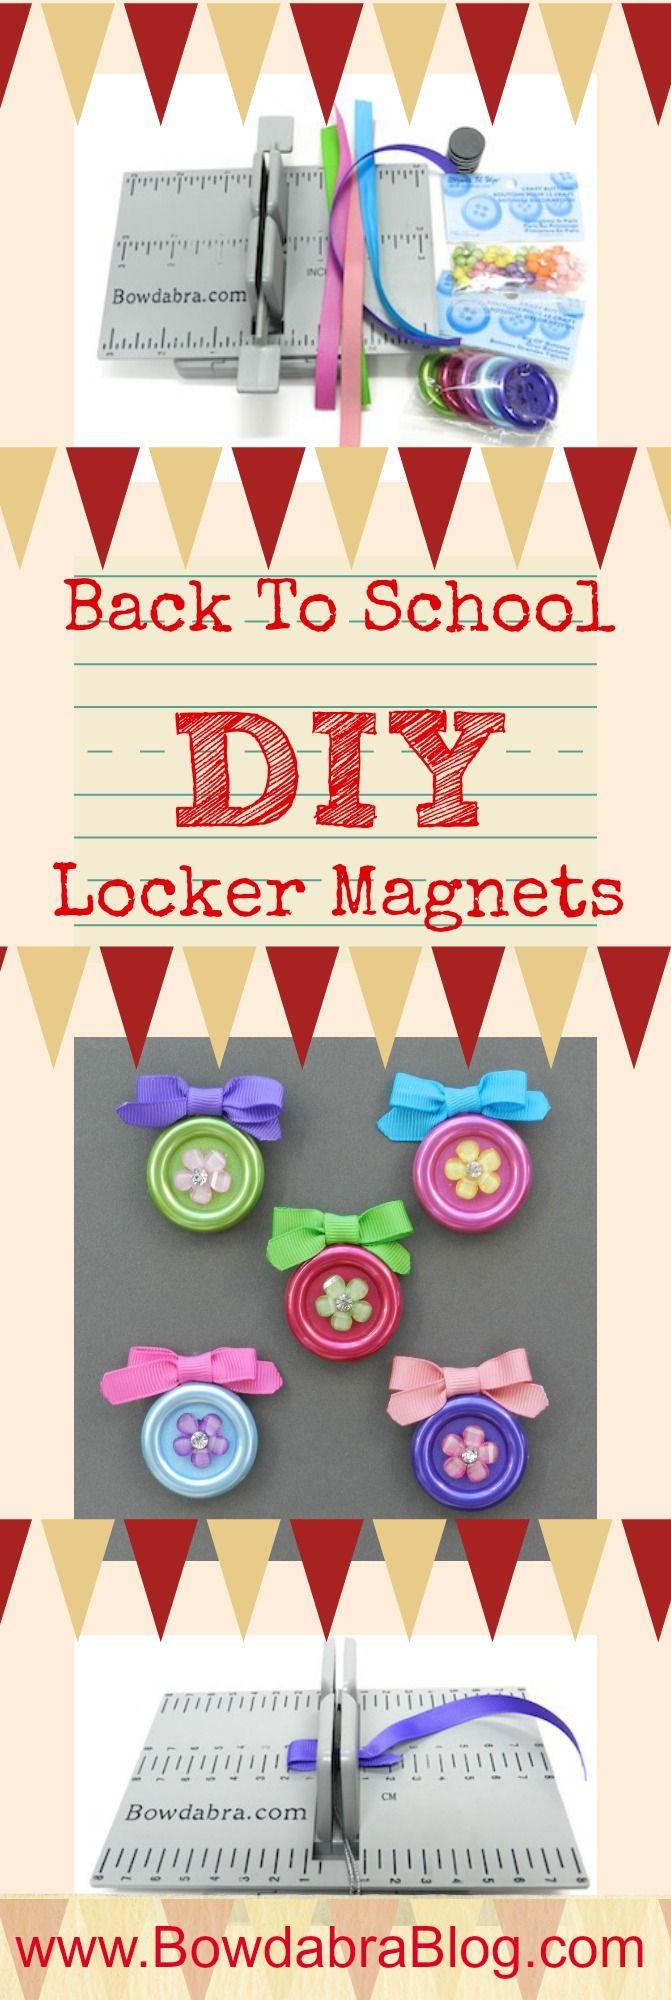 Back To School DIY Locker Magnets